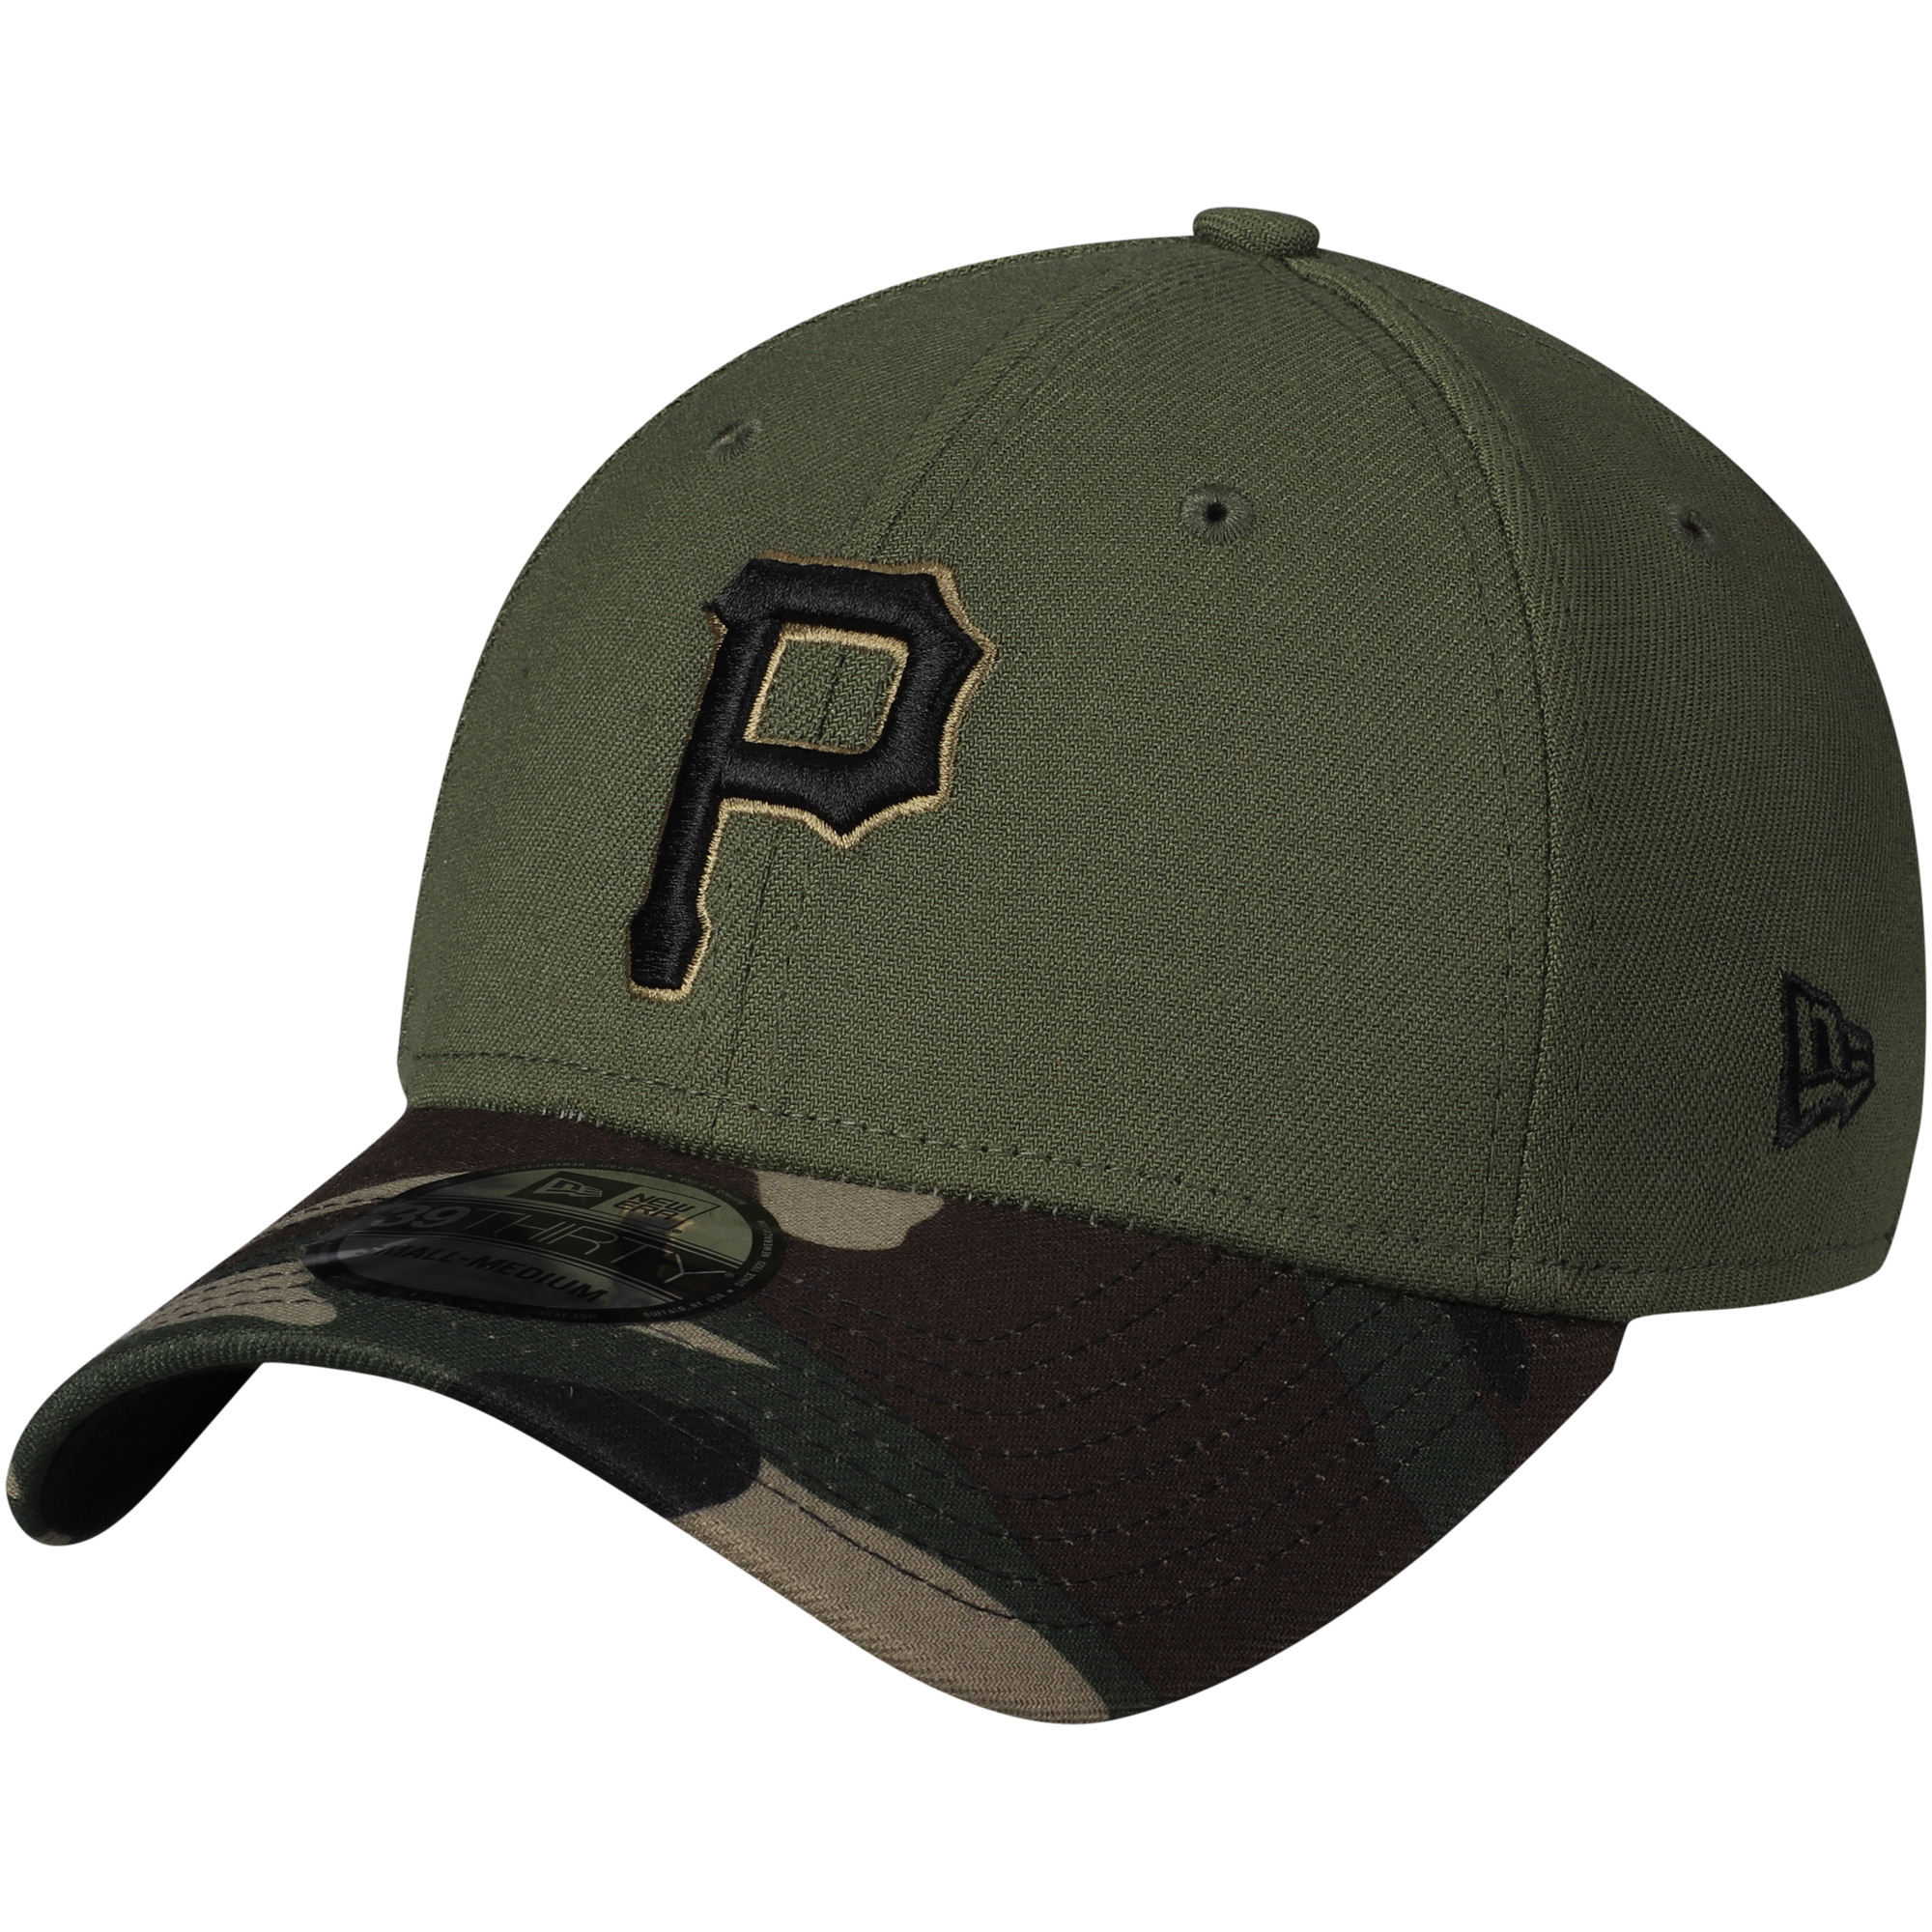 Pittsburgh Pirates New Era Alternate 3 Team Classic 39THIRTY Flex Hat - Green